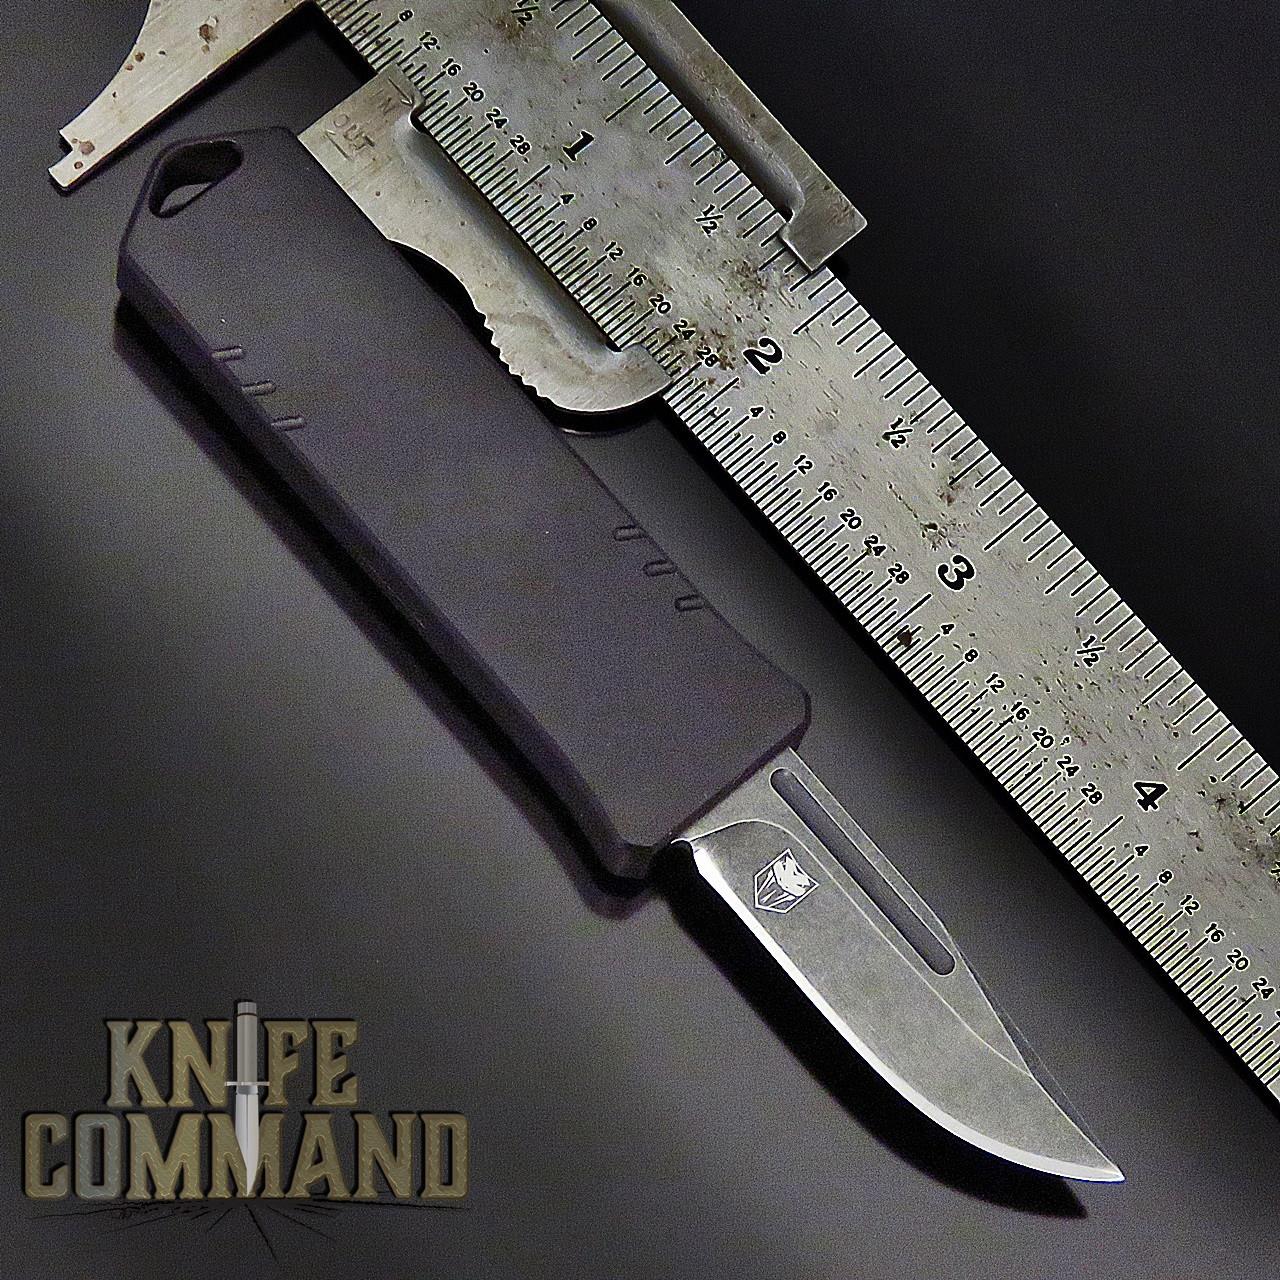 Boker Plus USA USB Black OTF Automatic Knife Black / Dark Stonewash D2 06EX270 Cobratec Knives